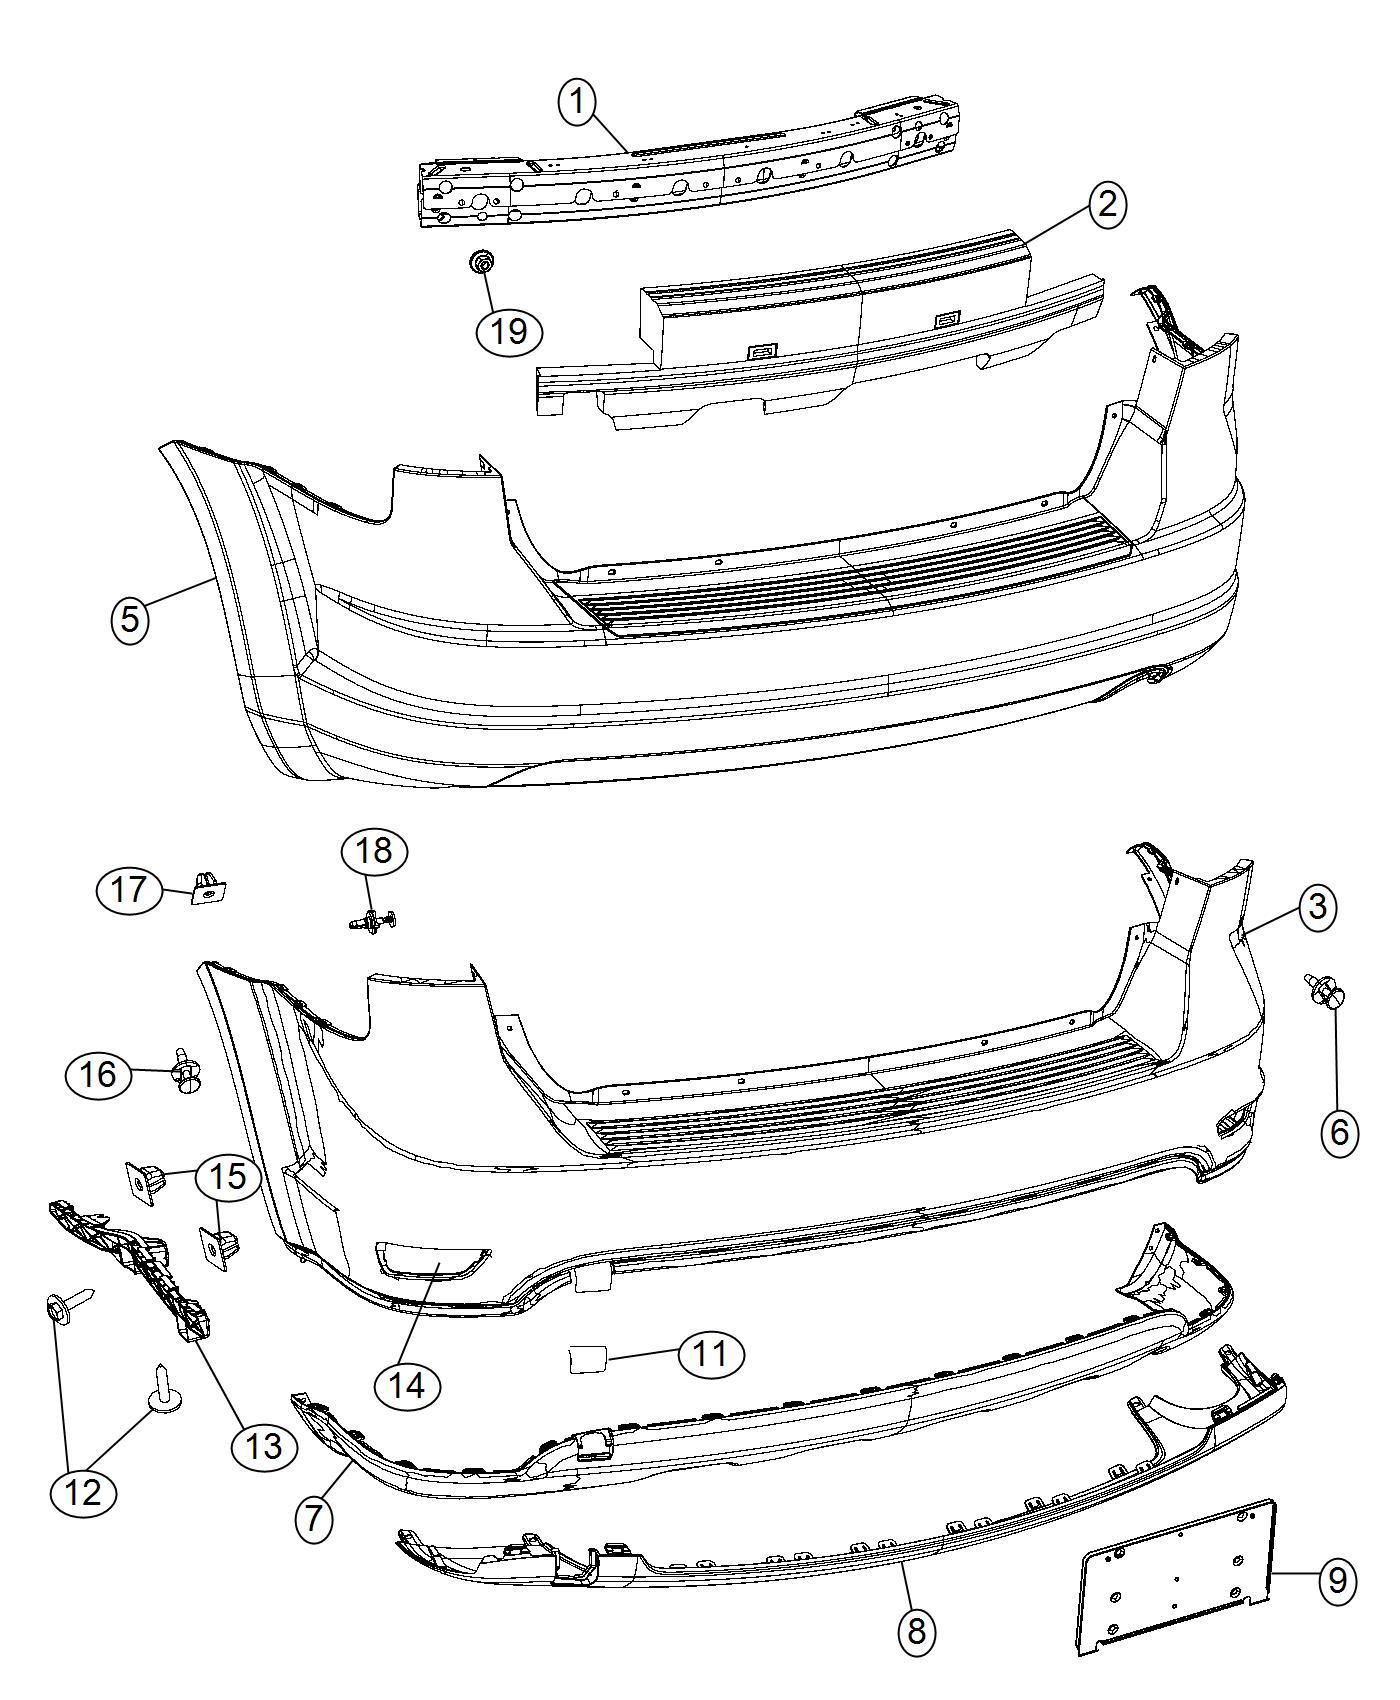 2014 Dodge Journey Applique. Fascia. Rear, fascias, mcd